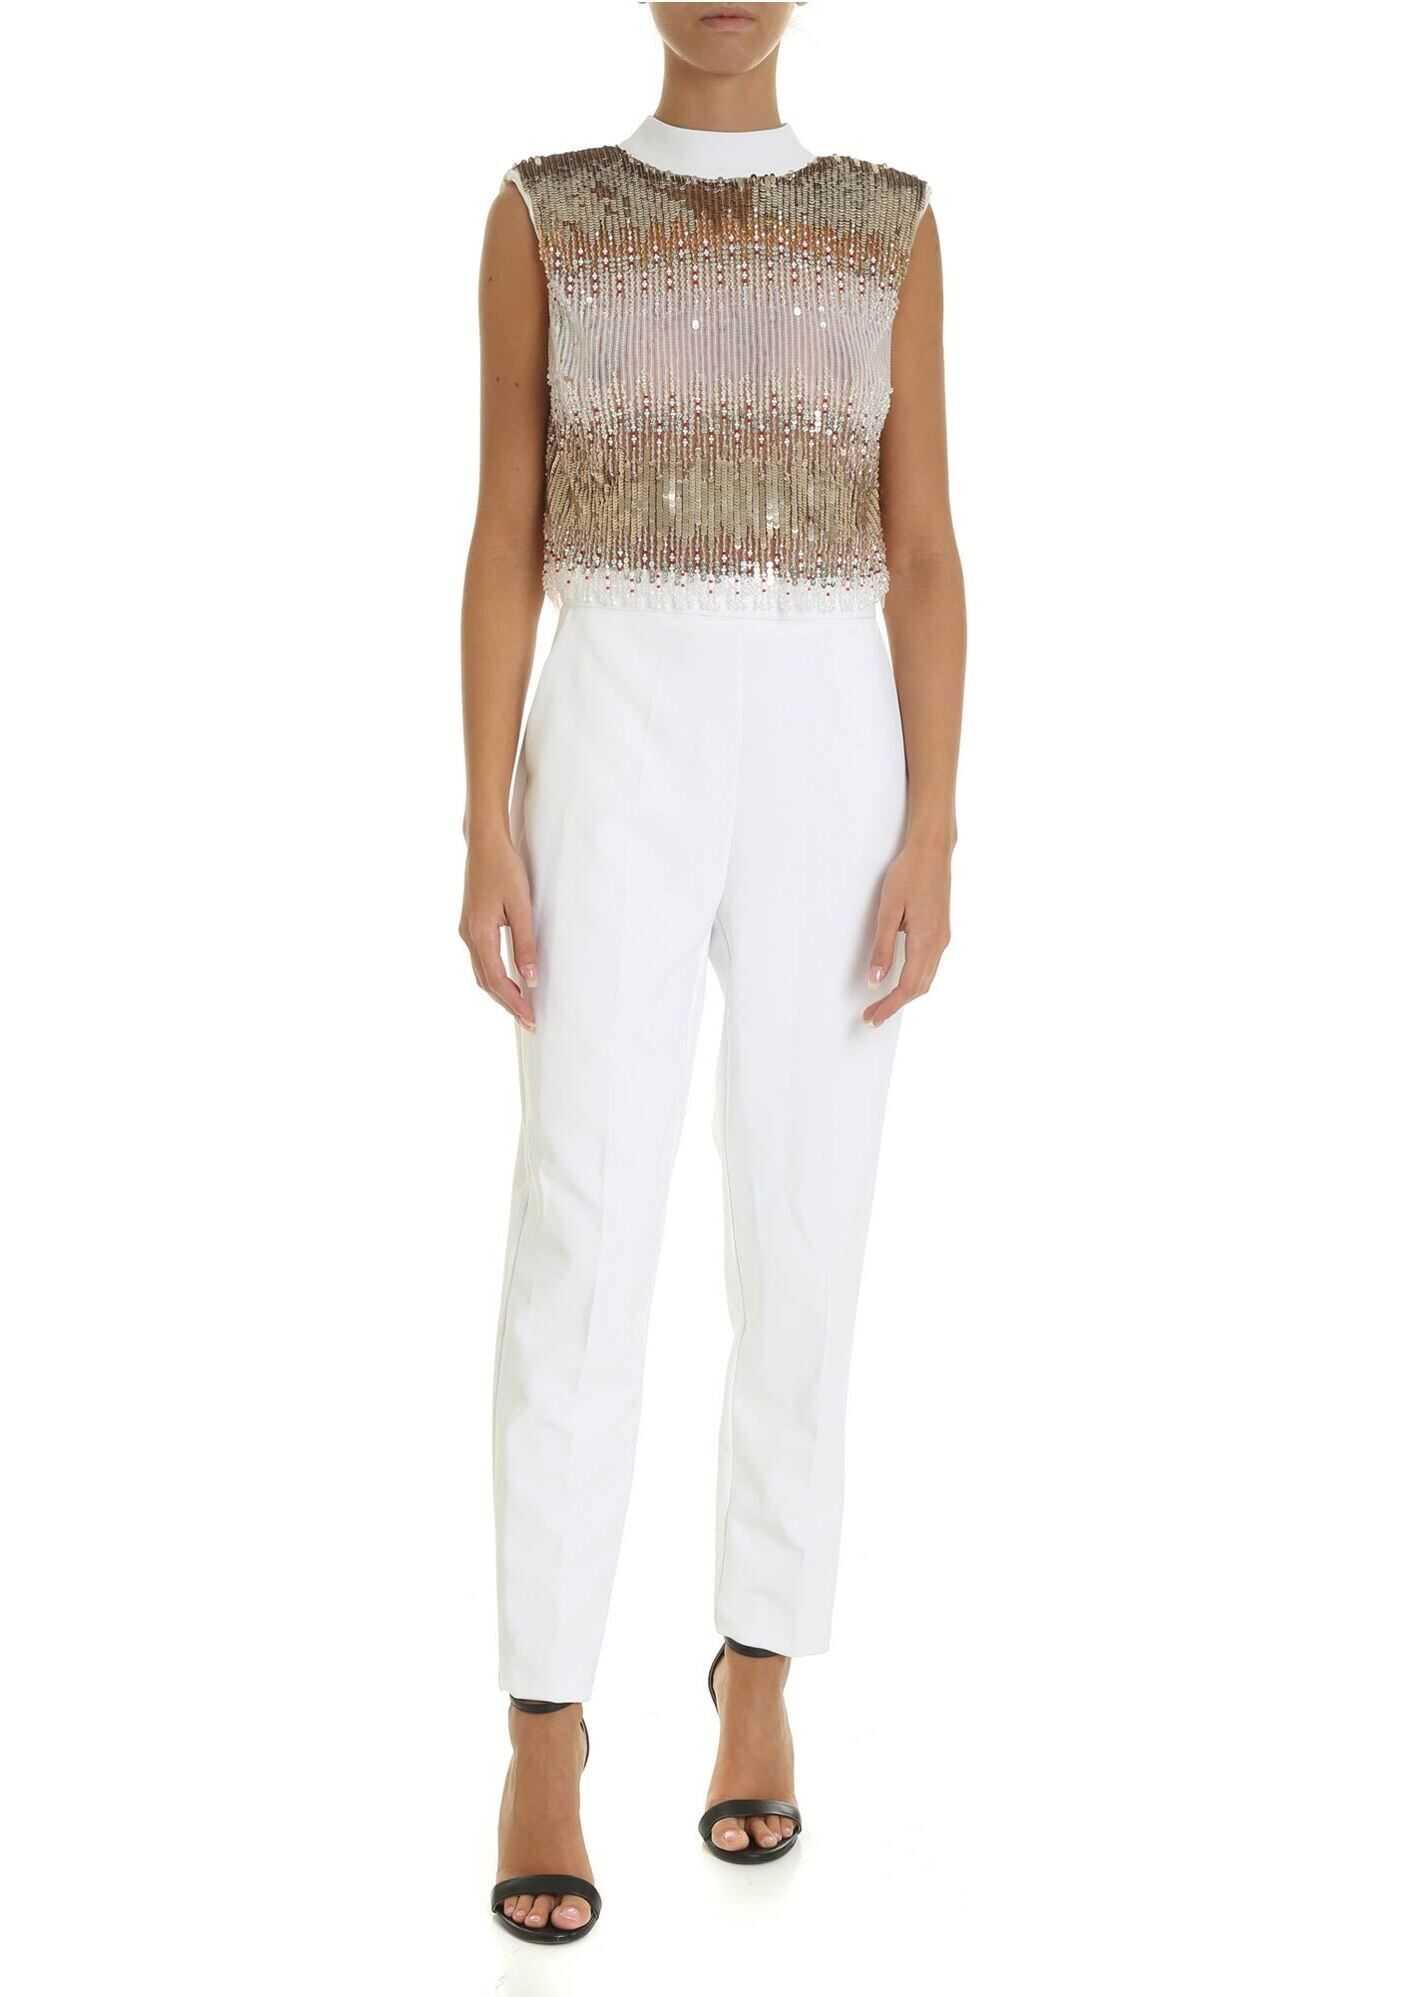 Elisabetta Franchi White Sleeveless Jumpsuit With Sequins White